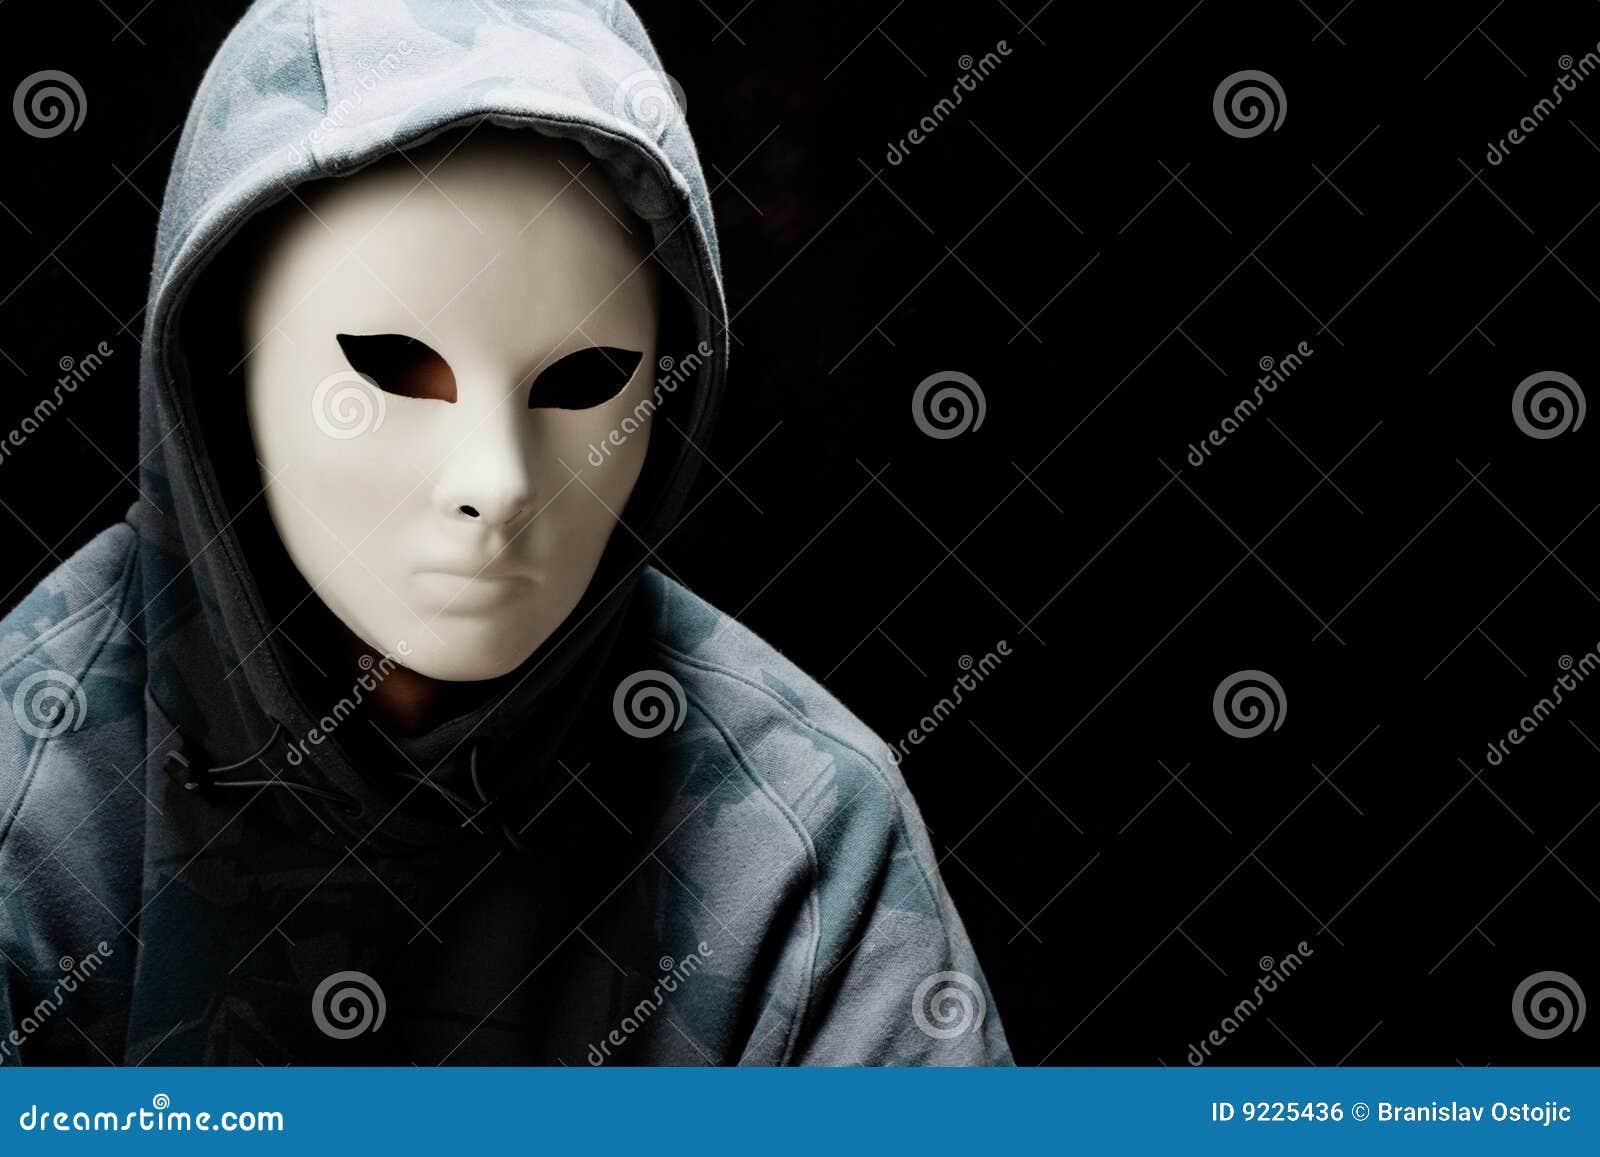 https://thumbs.dreamstime.com/z/man-wearing-white-mask-hood-9225436.jpg